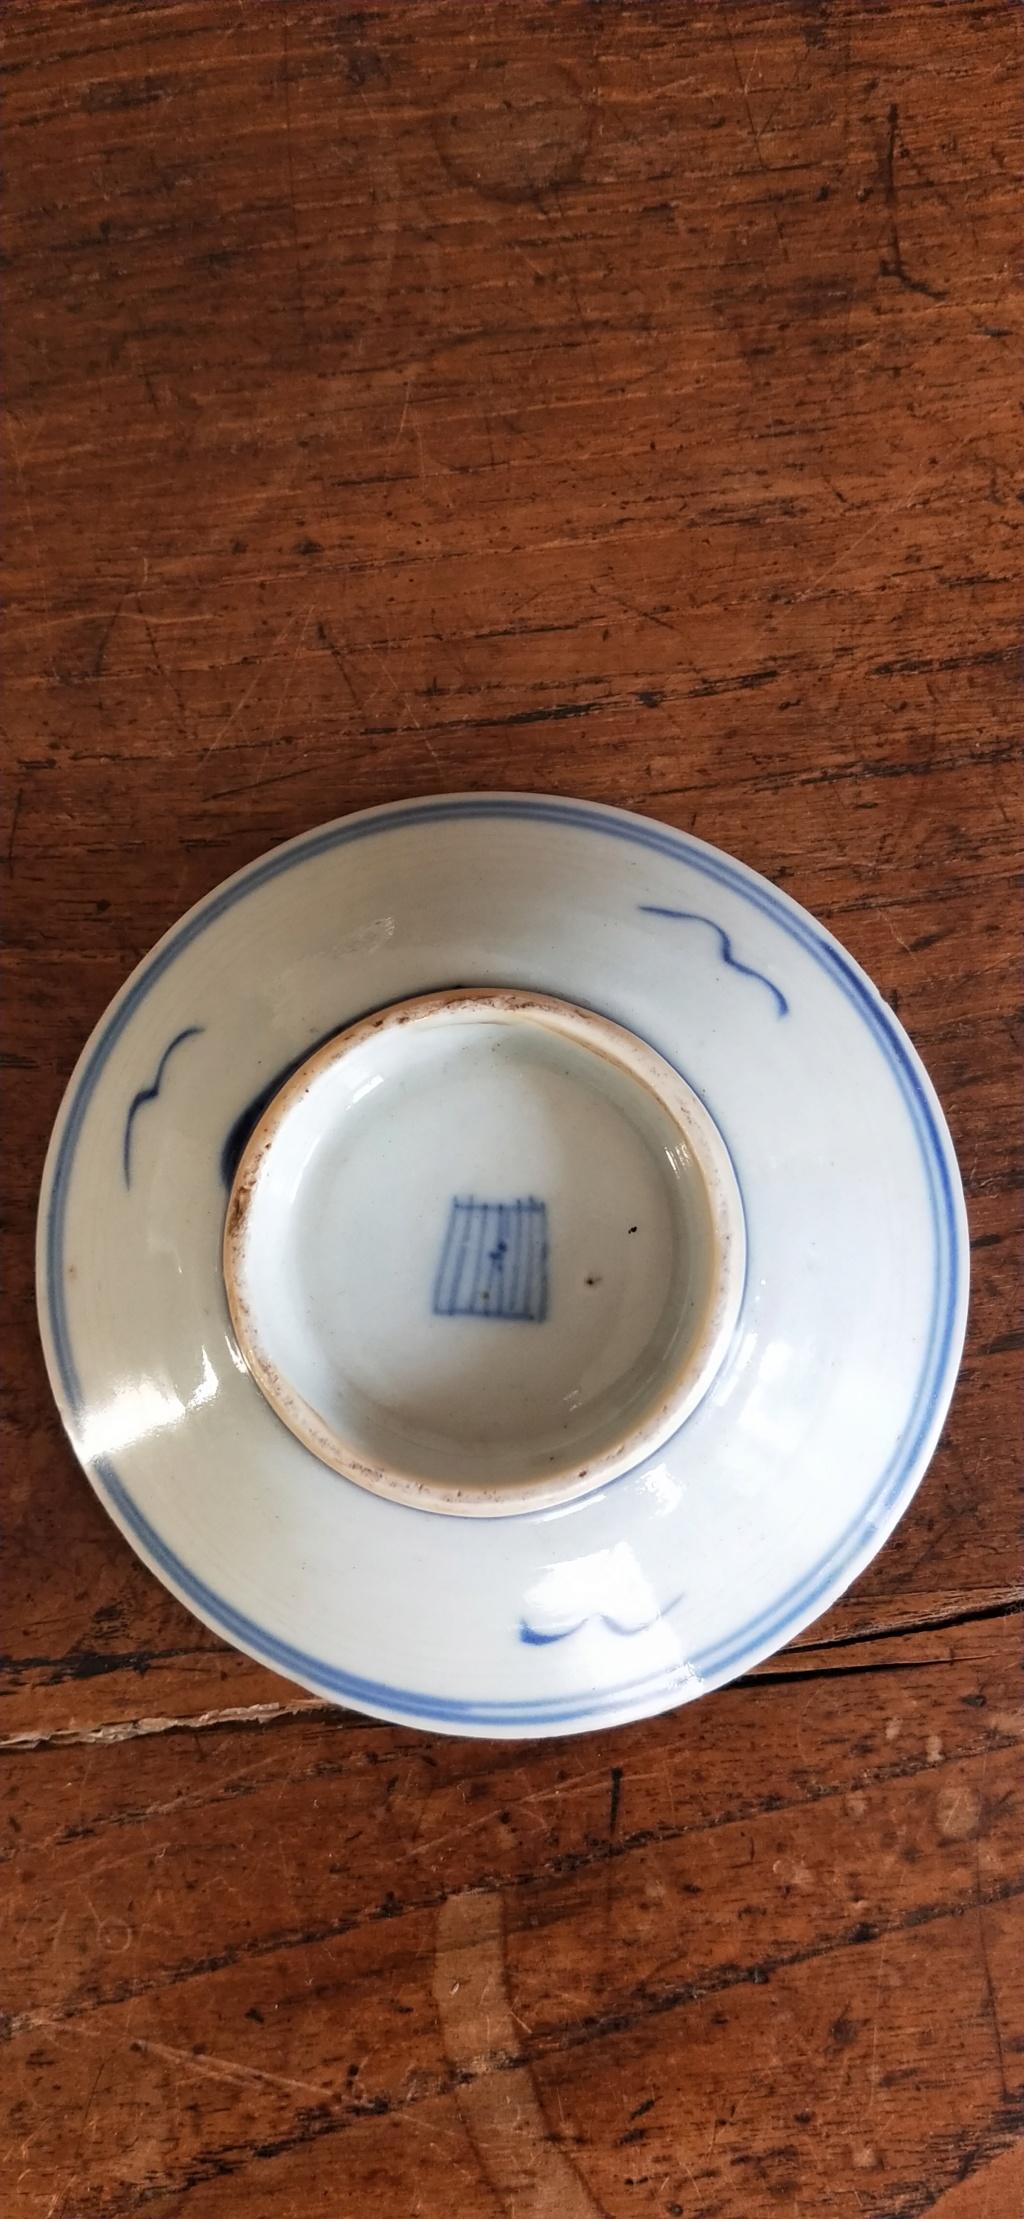 Confirmation coupelle porcelaine chinoise 19e 15753610